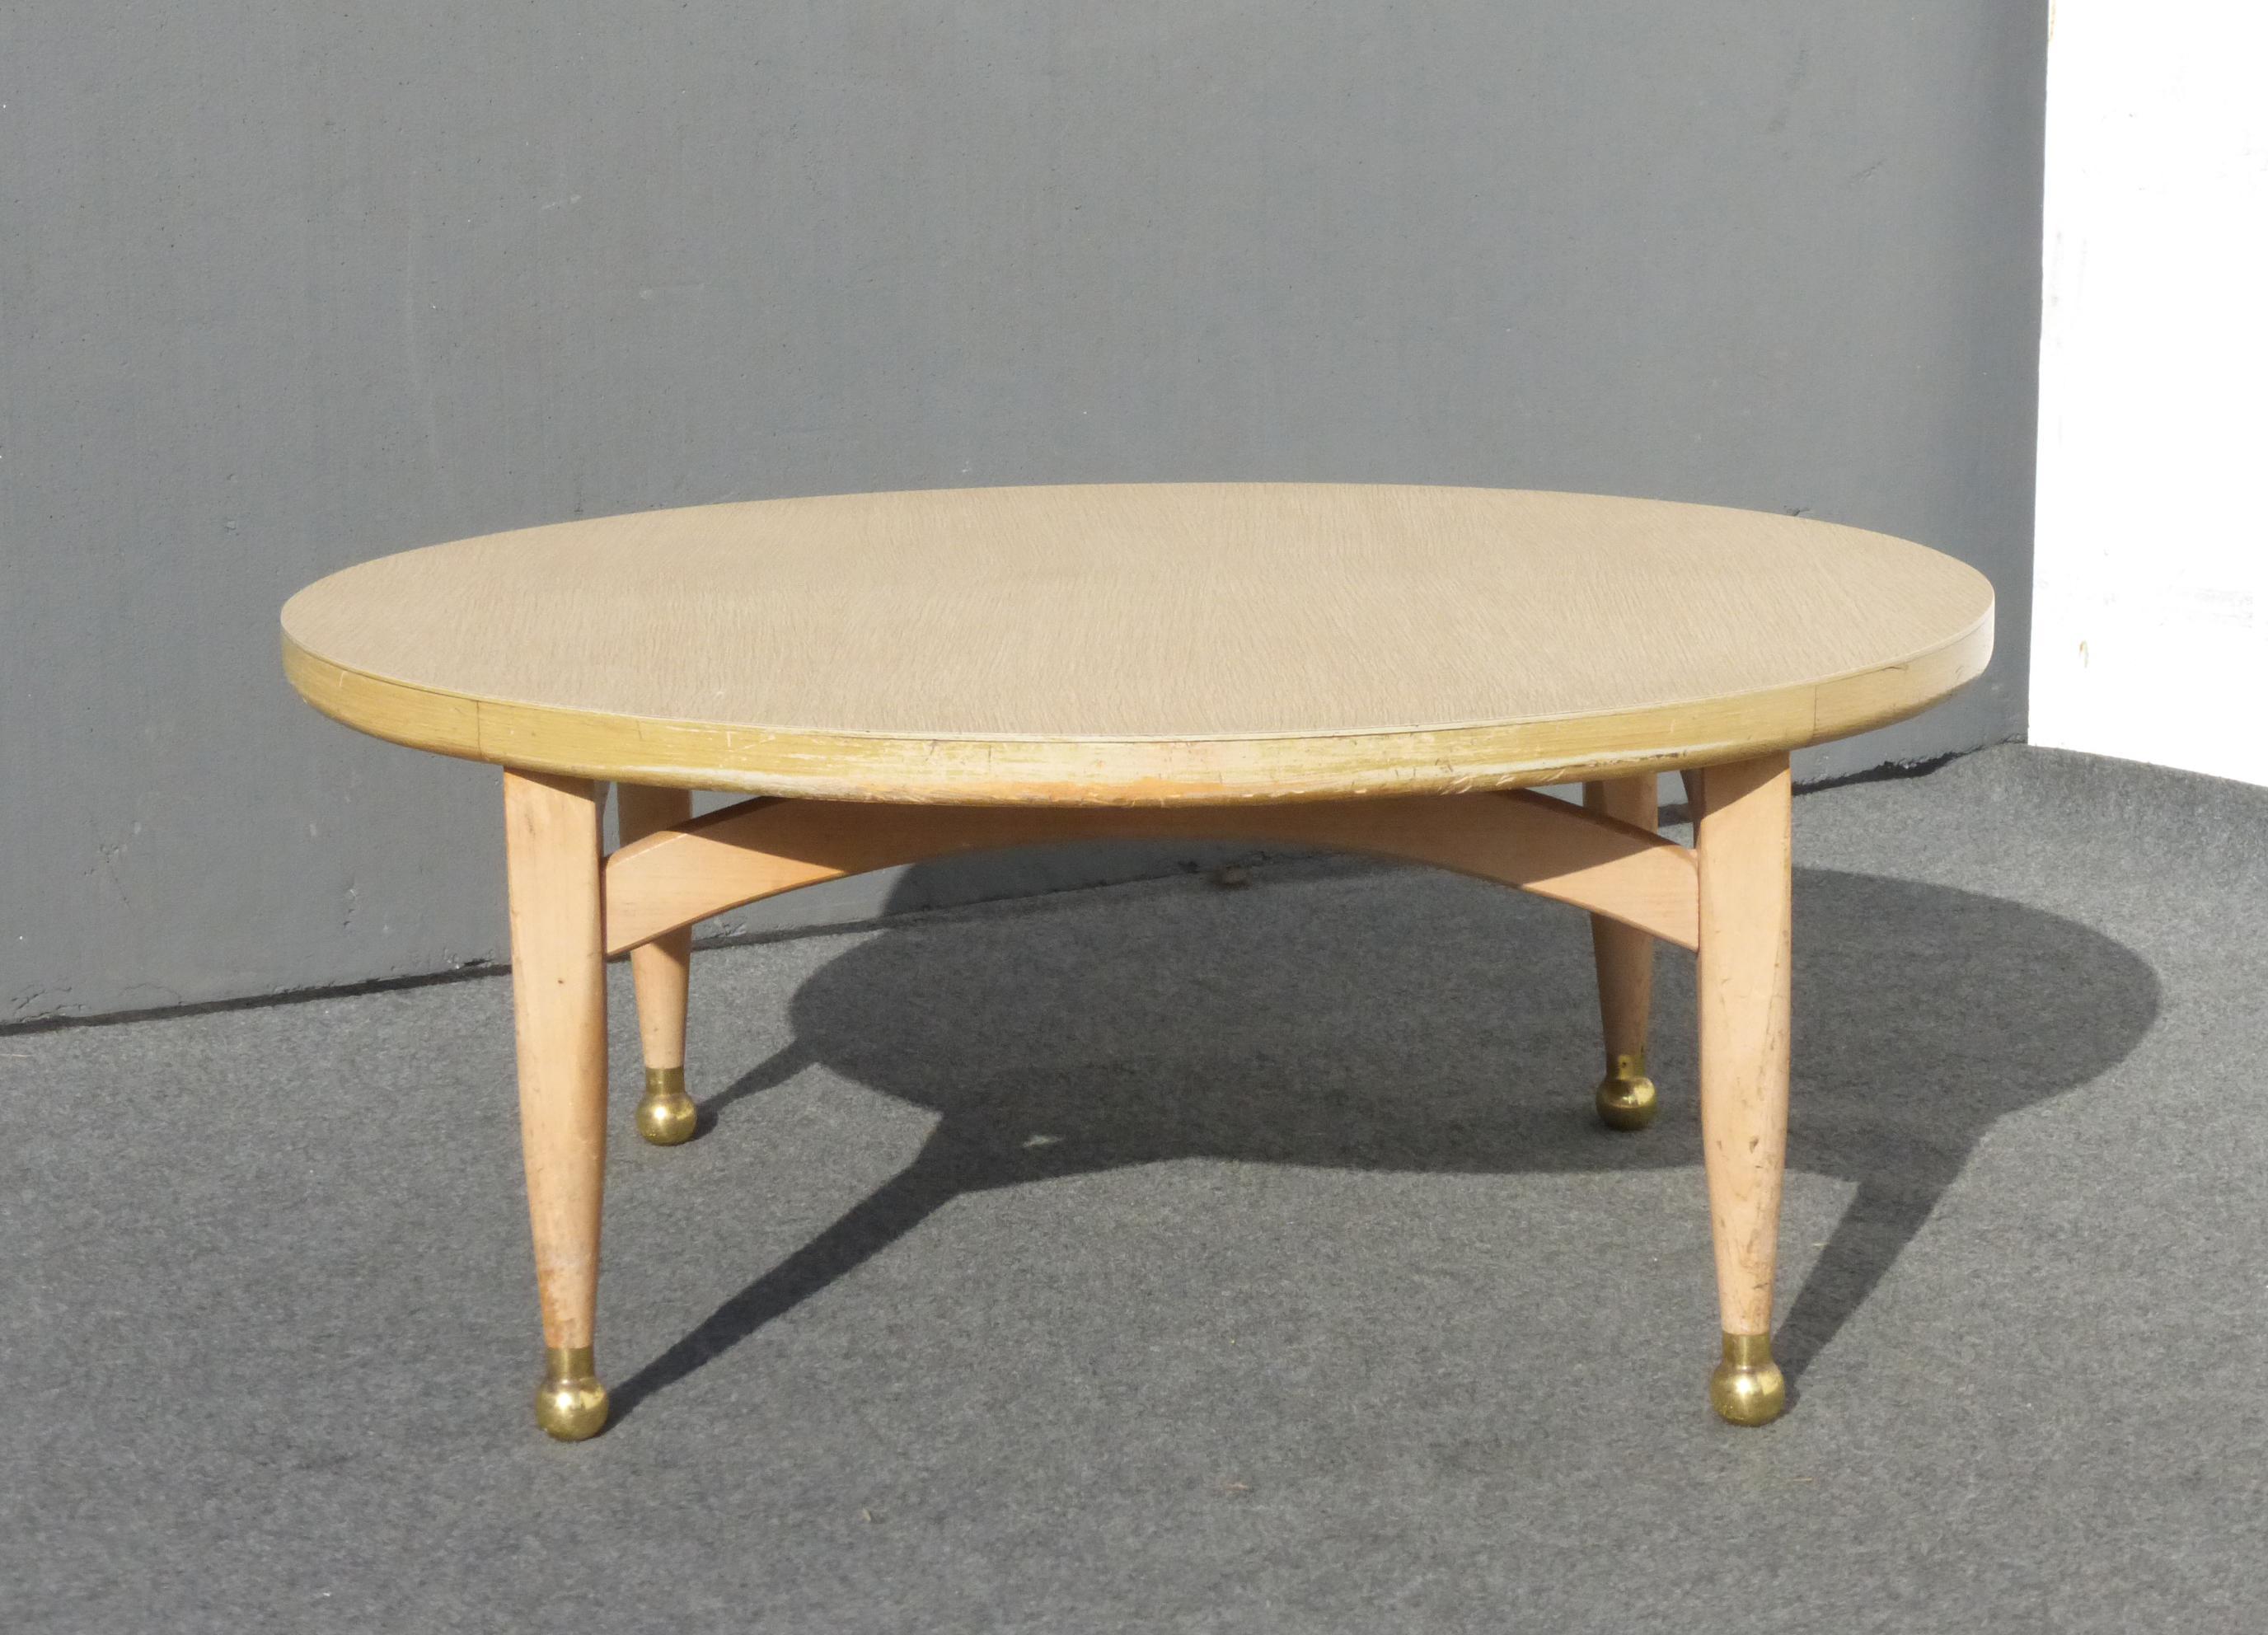 Attirant Vintage Danish Mid Century Modern Style Round COFFEE TABLE Peg Leg U0026 Gold  Feet Stylish Coffee